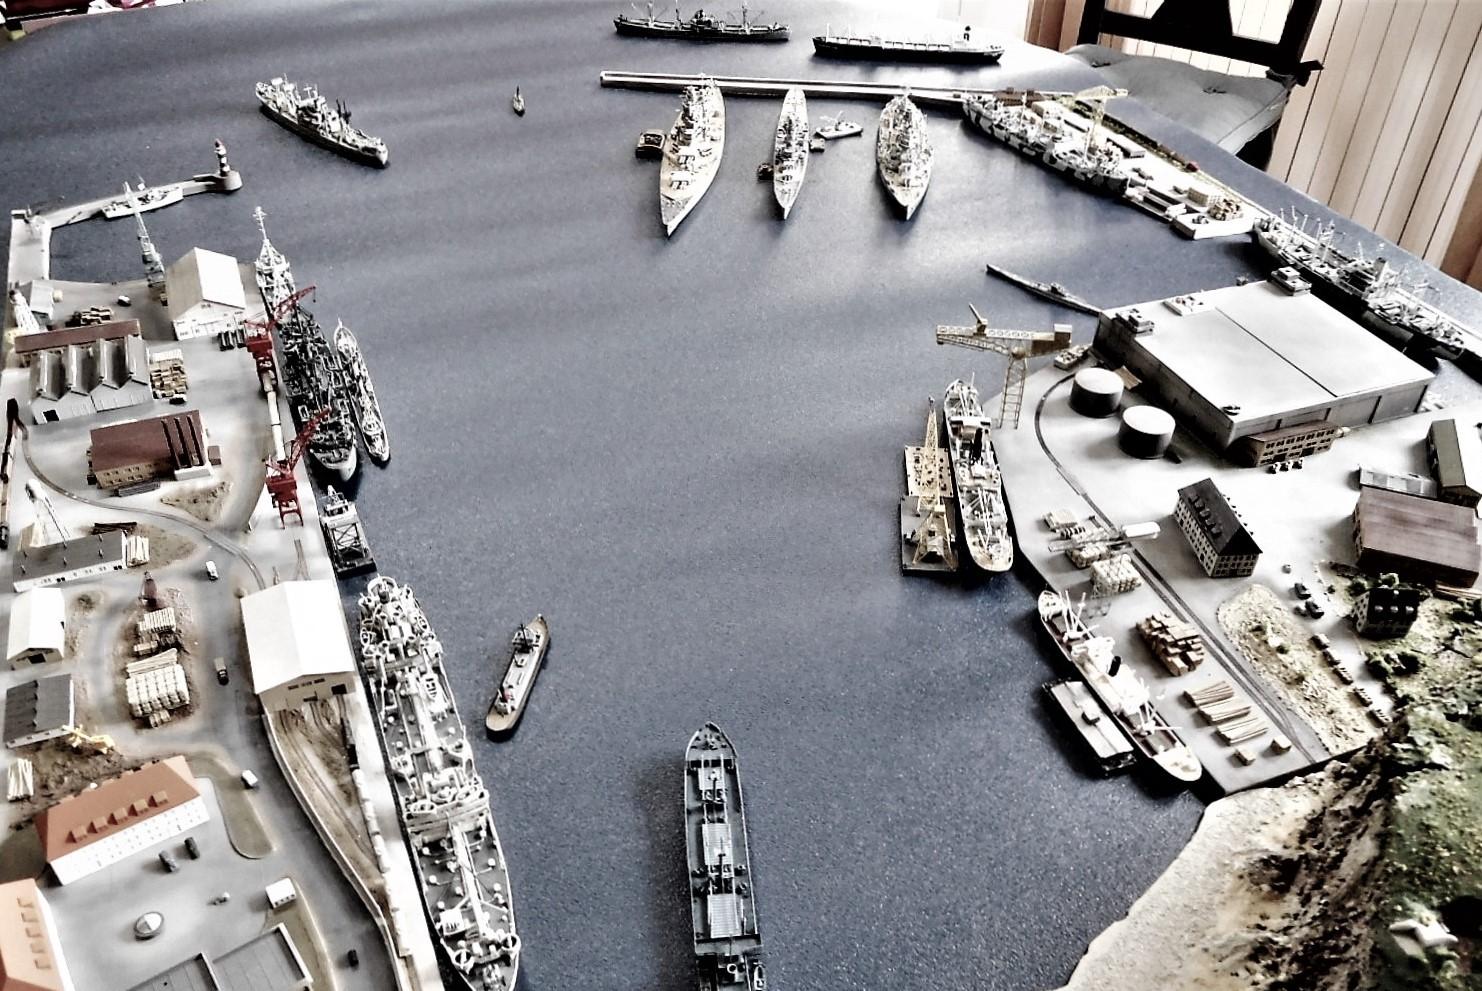 Diorama base navale 1/700 par Nesquik - Page 4 O7IH5bLg